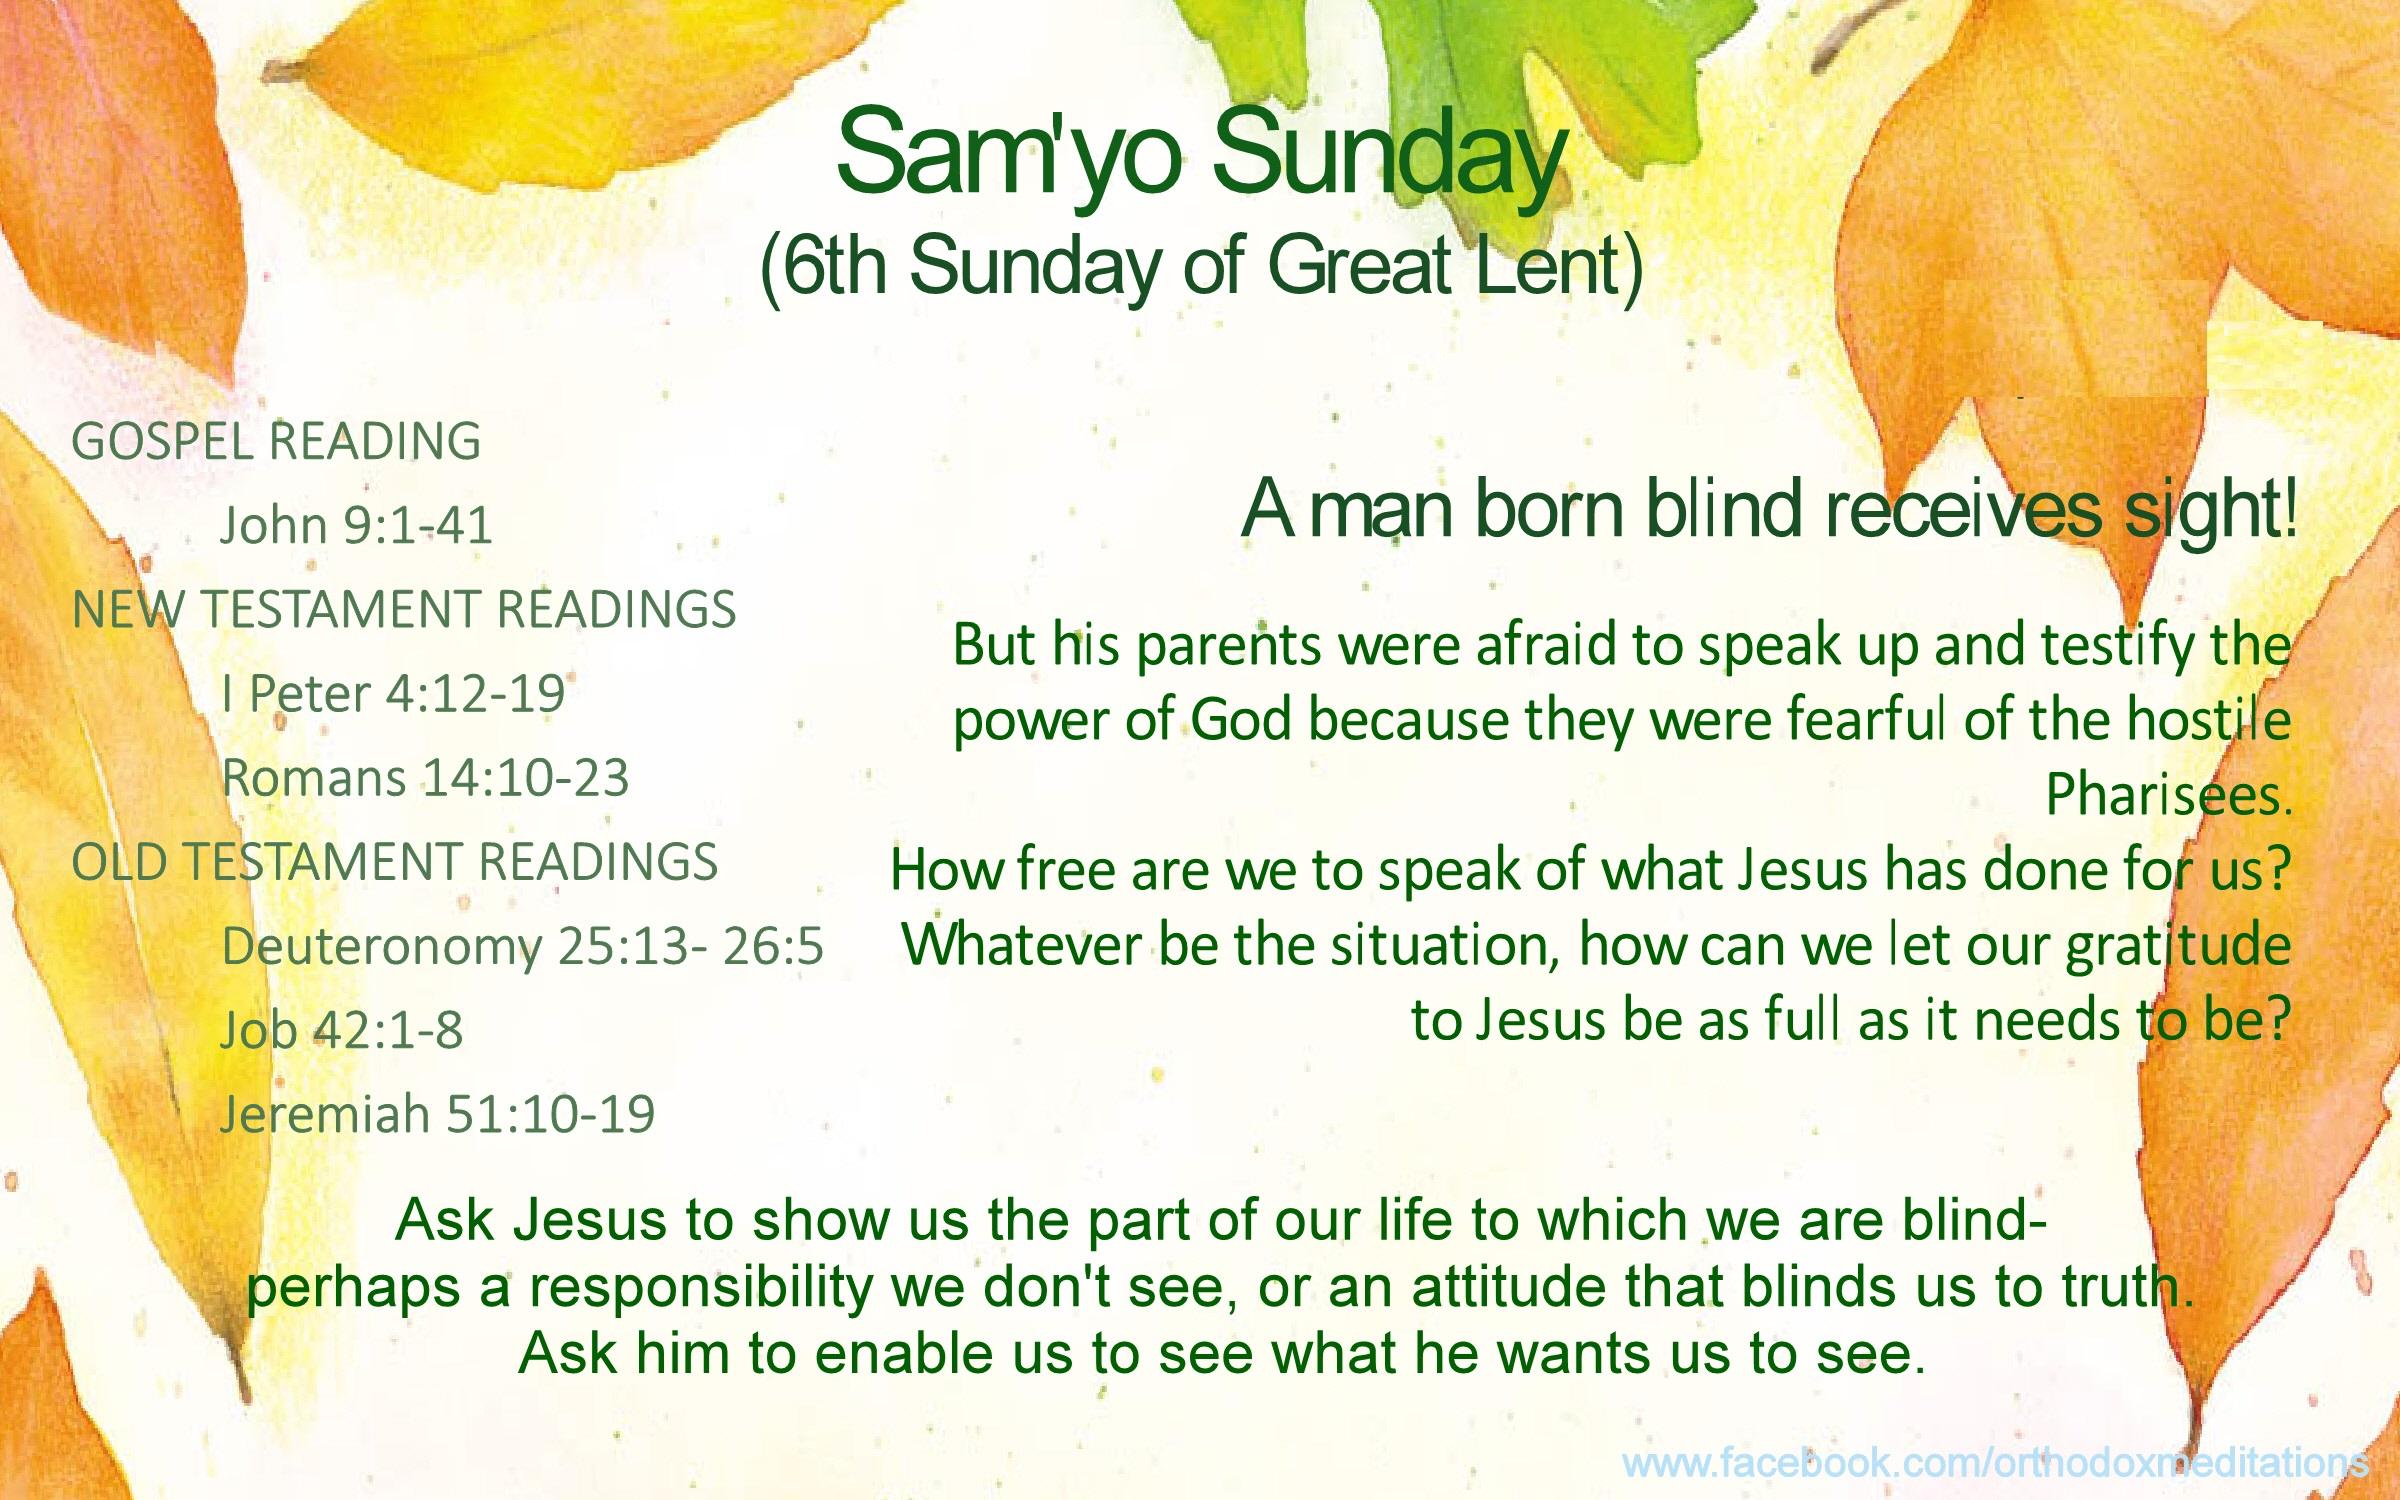 Samyo-Sunday_001